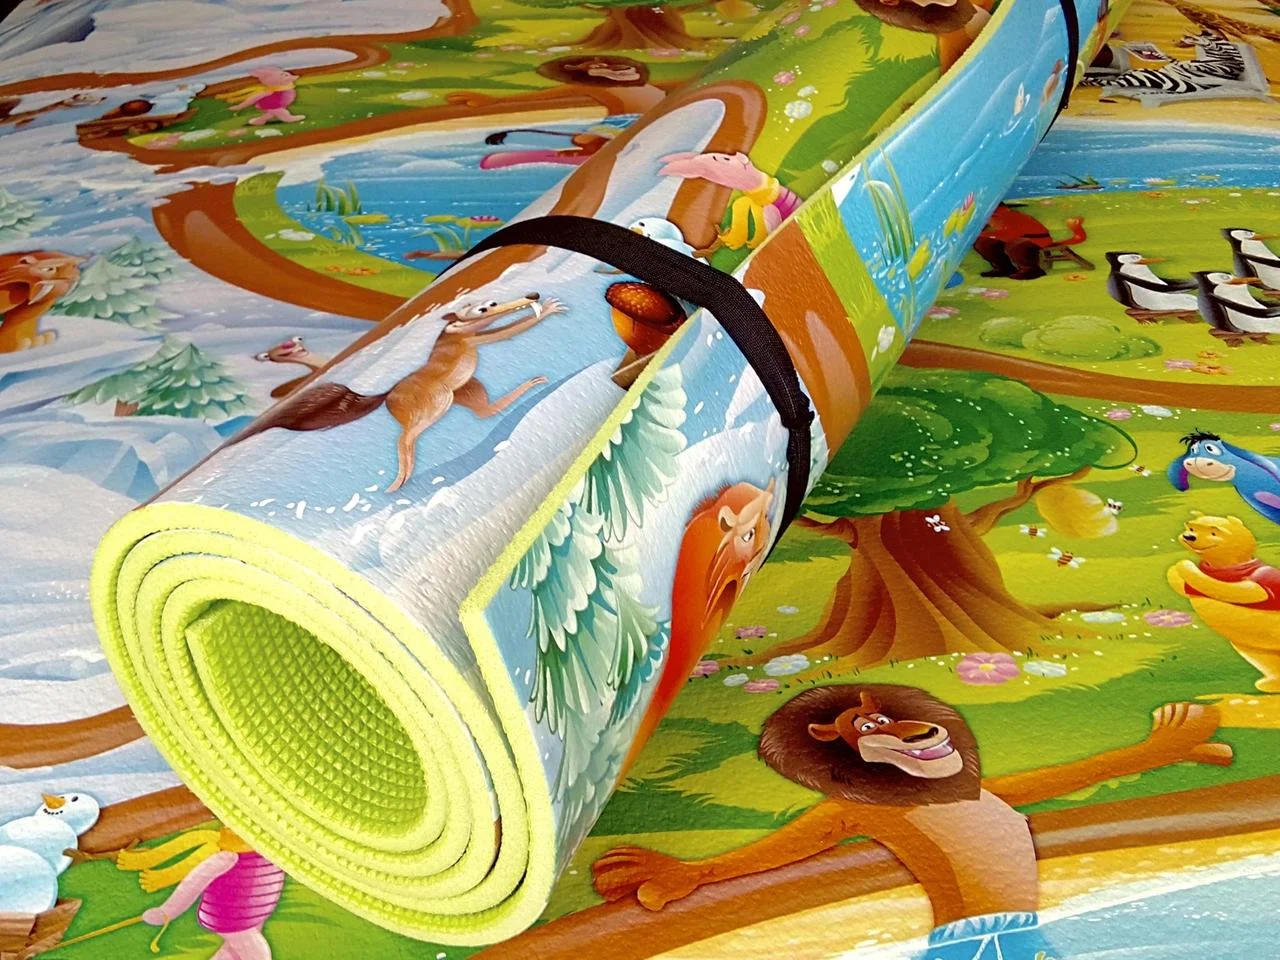 Детский коврик 2500х1200х8мм  теплоизоляционный, развивающий, игровой коврик